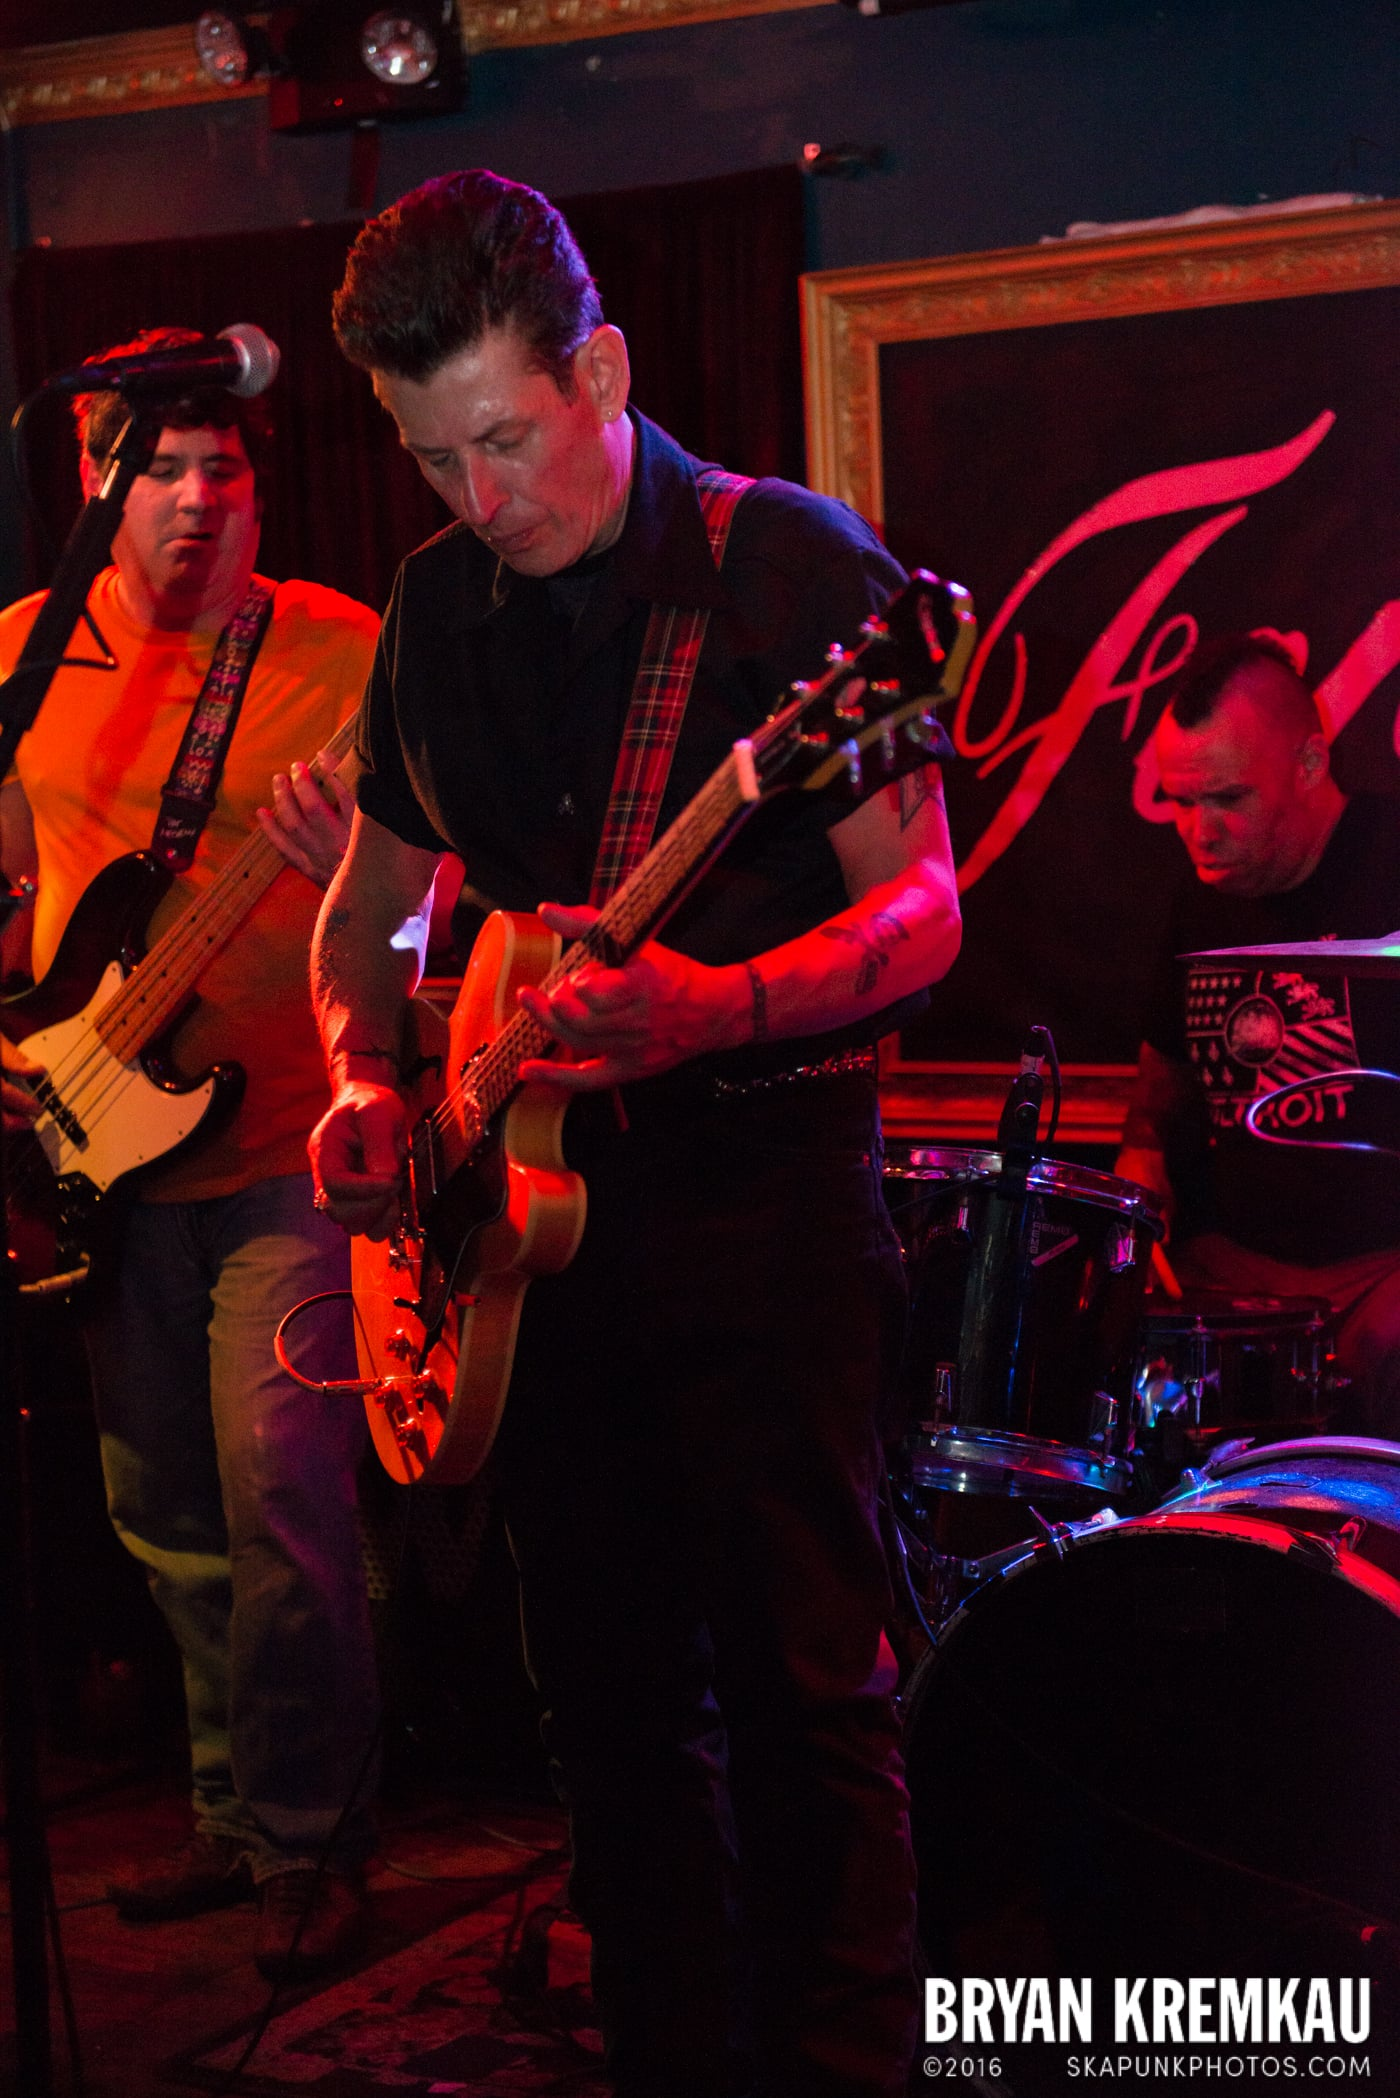 Roddy Radiation & The Scotch Bonnets @ Fontana's, NYC - 4.25.15 (6)